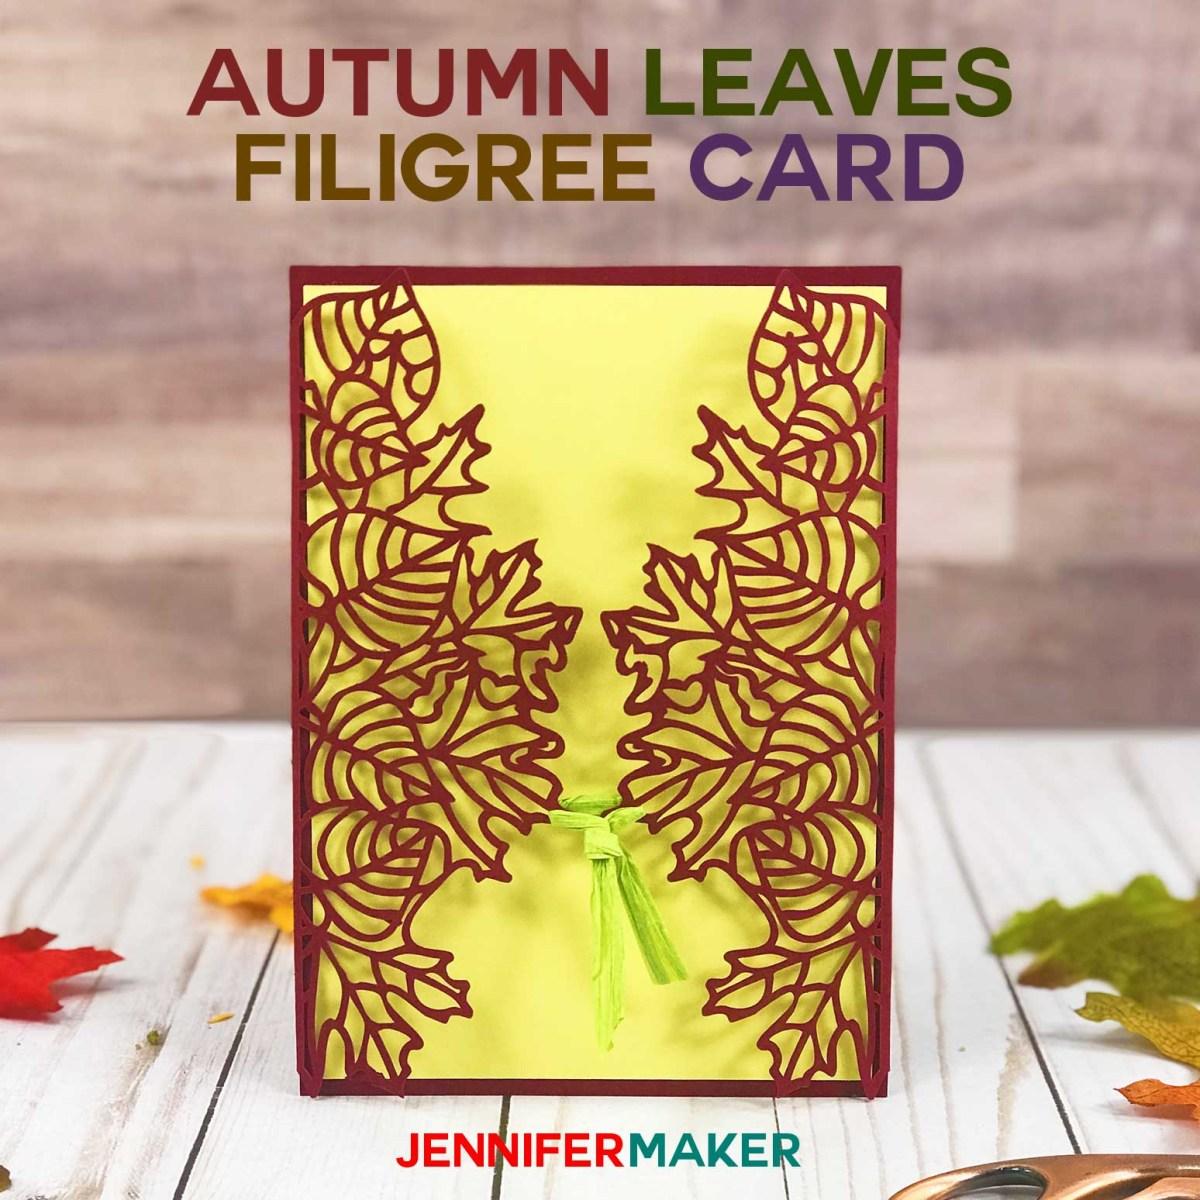 Fall Wedding Invitation Make Autumn Fall Wedding Invitations And Cards Jennifer Maker